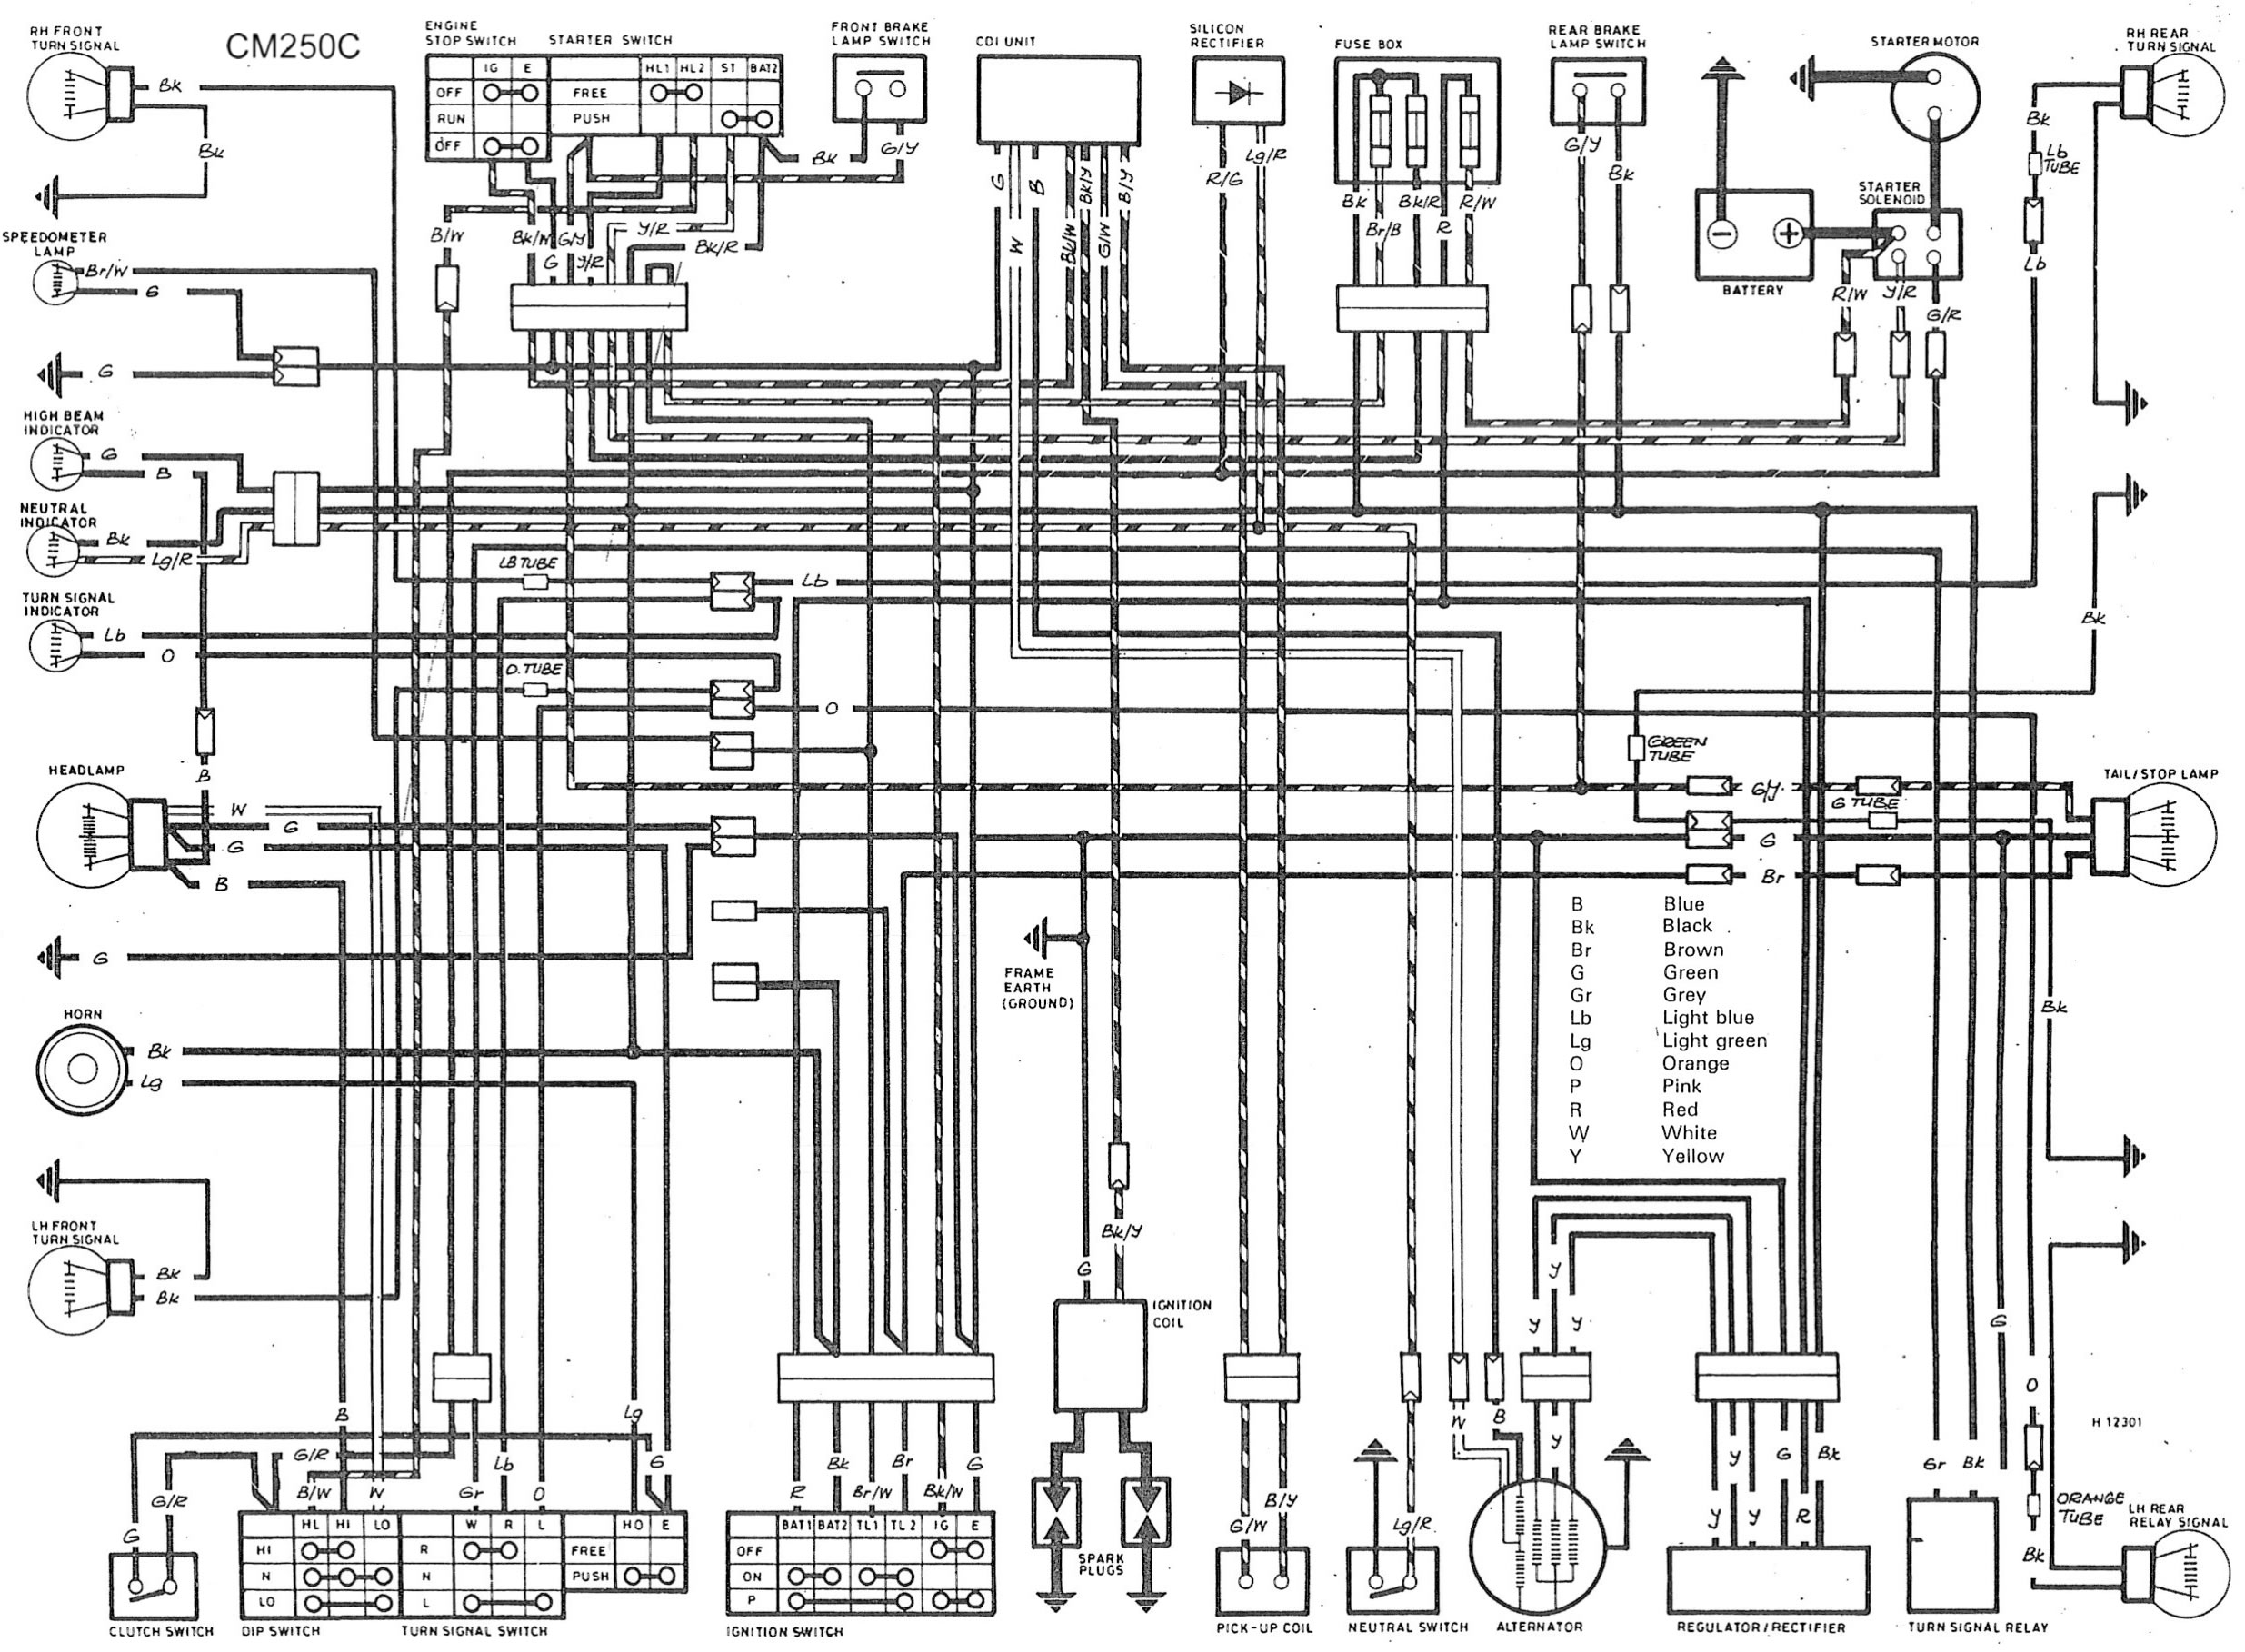 Ignition Transformer Wiring Diagram : Xv wiring diagram transformer diagrams